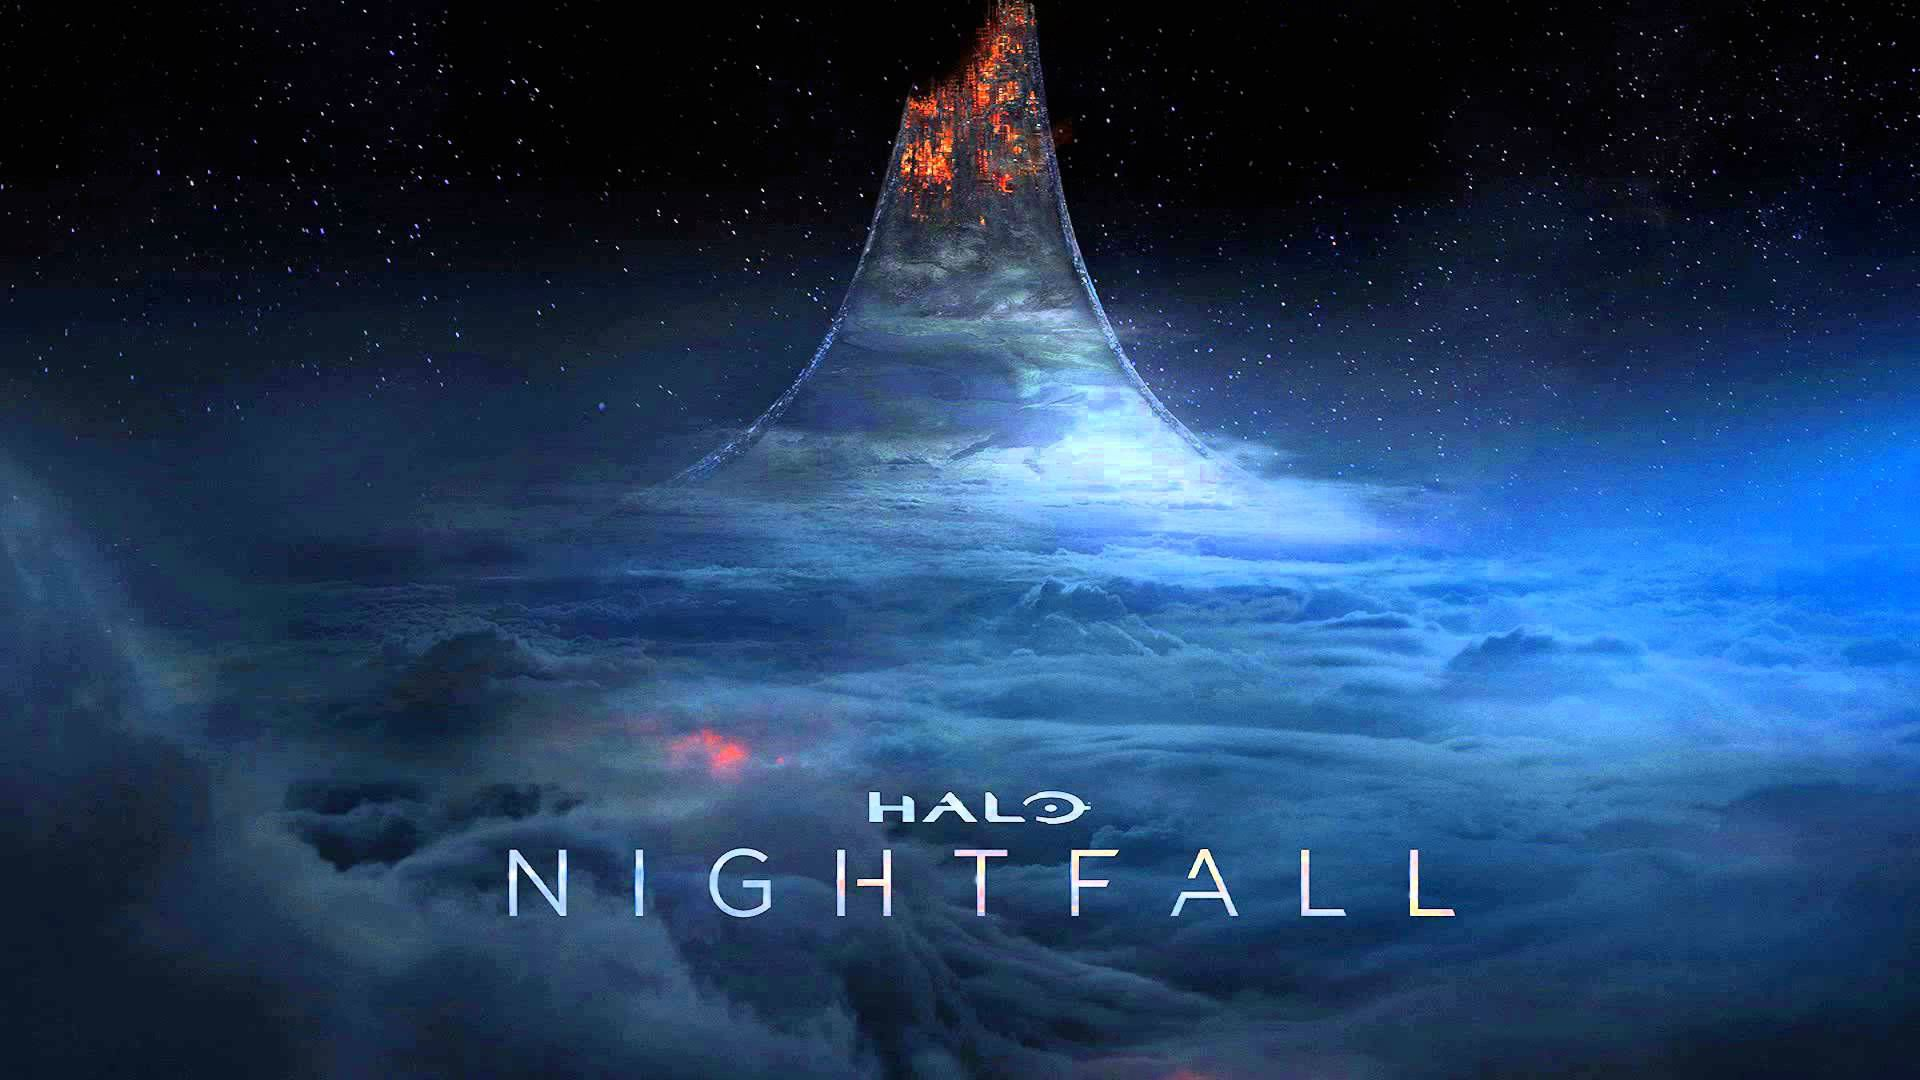 Microsoft Fall Wallpaper Halo Nightfall Sci Fi Futuristic Action Adventure Series